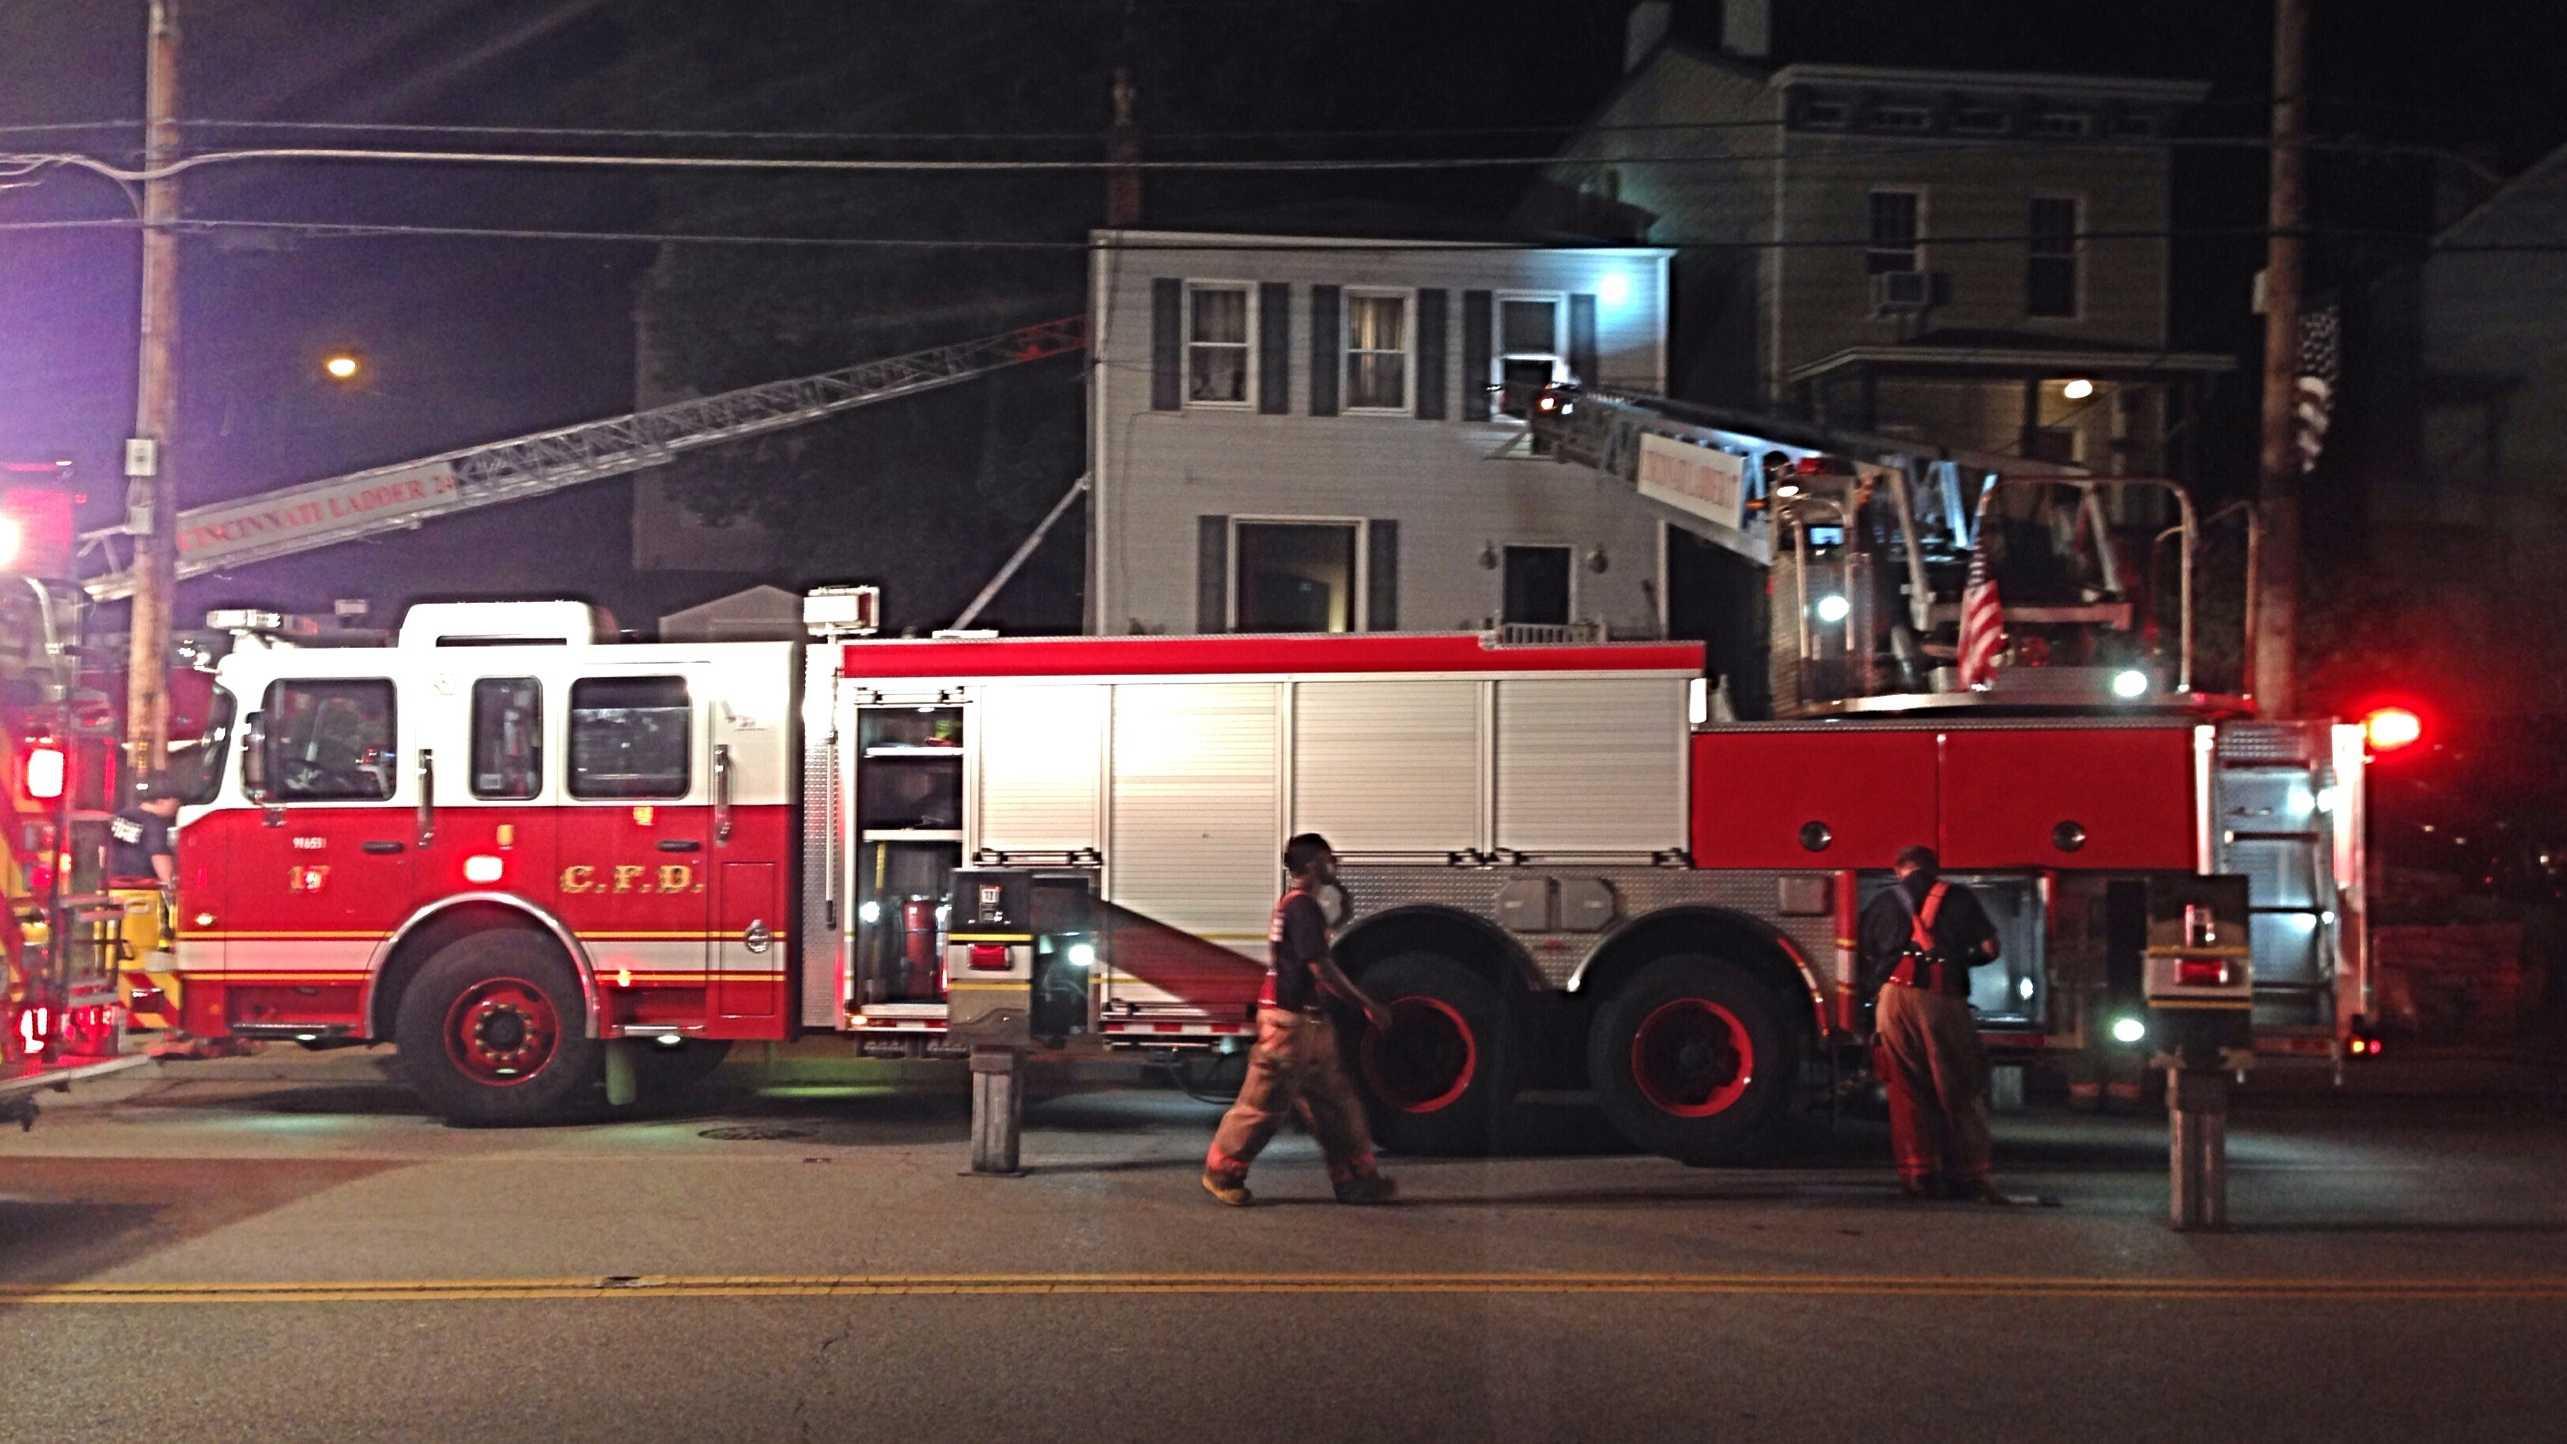 082114 sedamsville fire (3).jpg